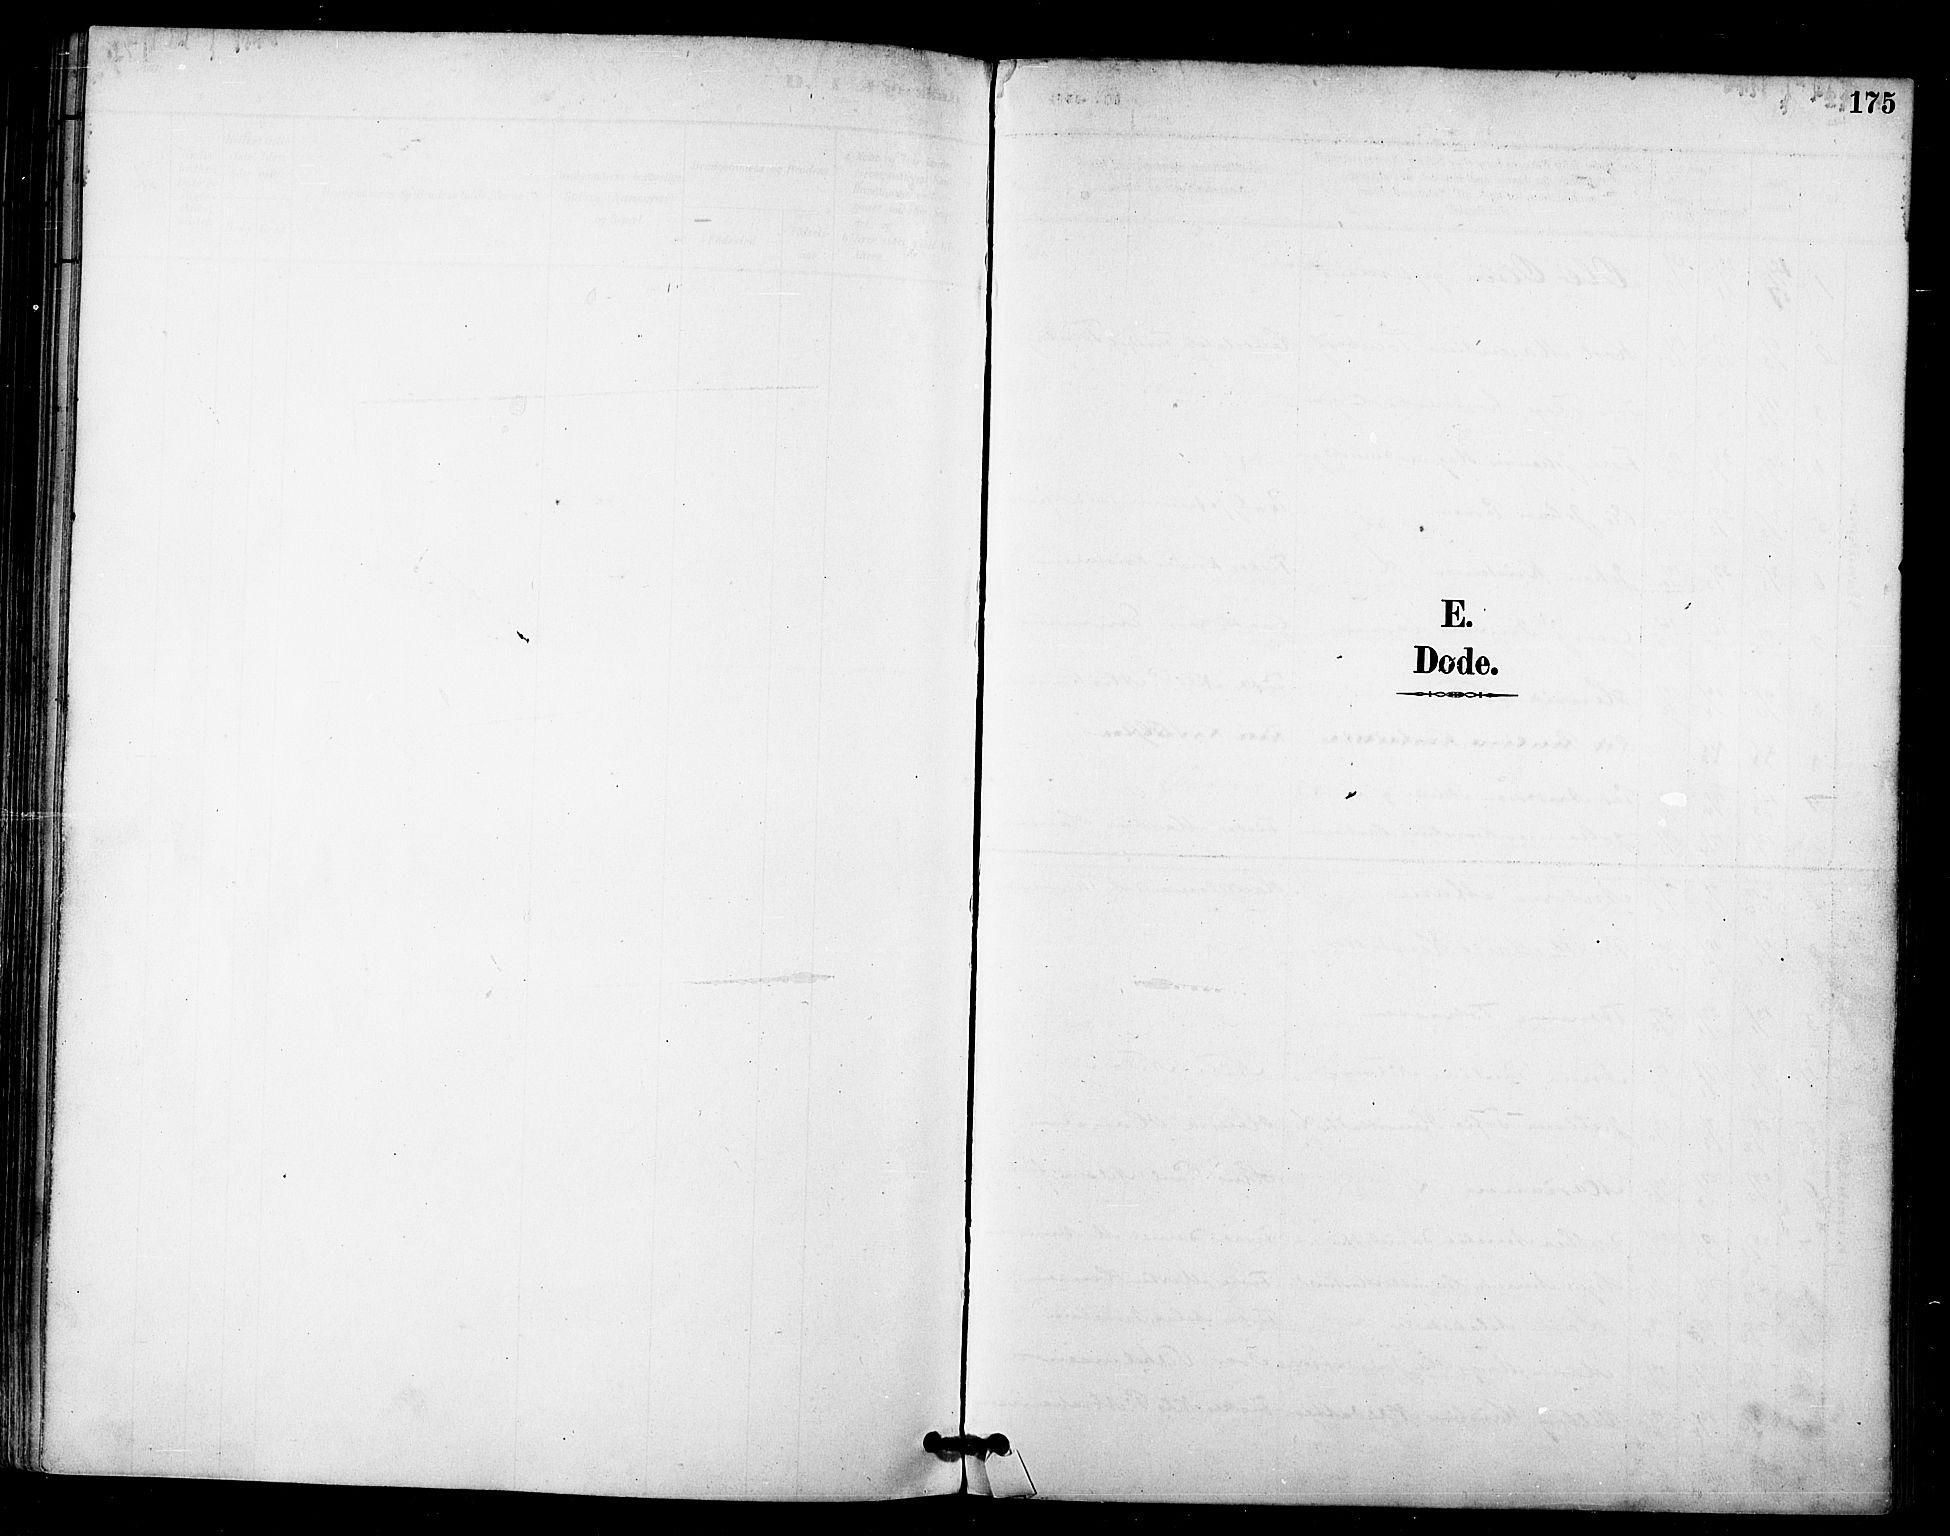 SATØ, Talvik sokneprestkontor, H/Ha/L0013kirke: Ministerialbok nr. 13, 1886-1897, s. 175